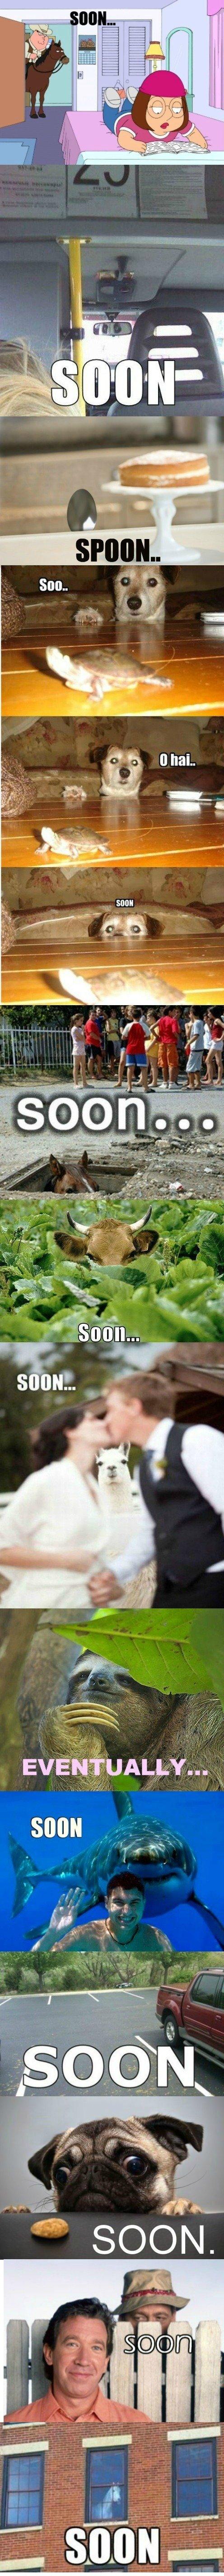 wtf regular omg! meme lulz lul LOL LOLWUT Lolz humor FUNNY haha ftgdw EPIC comic comedy blog Awesome all soon comp compilation soon... family guy spoon dog turtle horse cow llama sloth eventually shark car truck pug